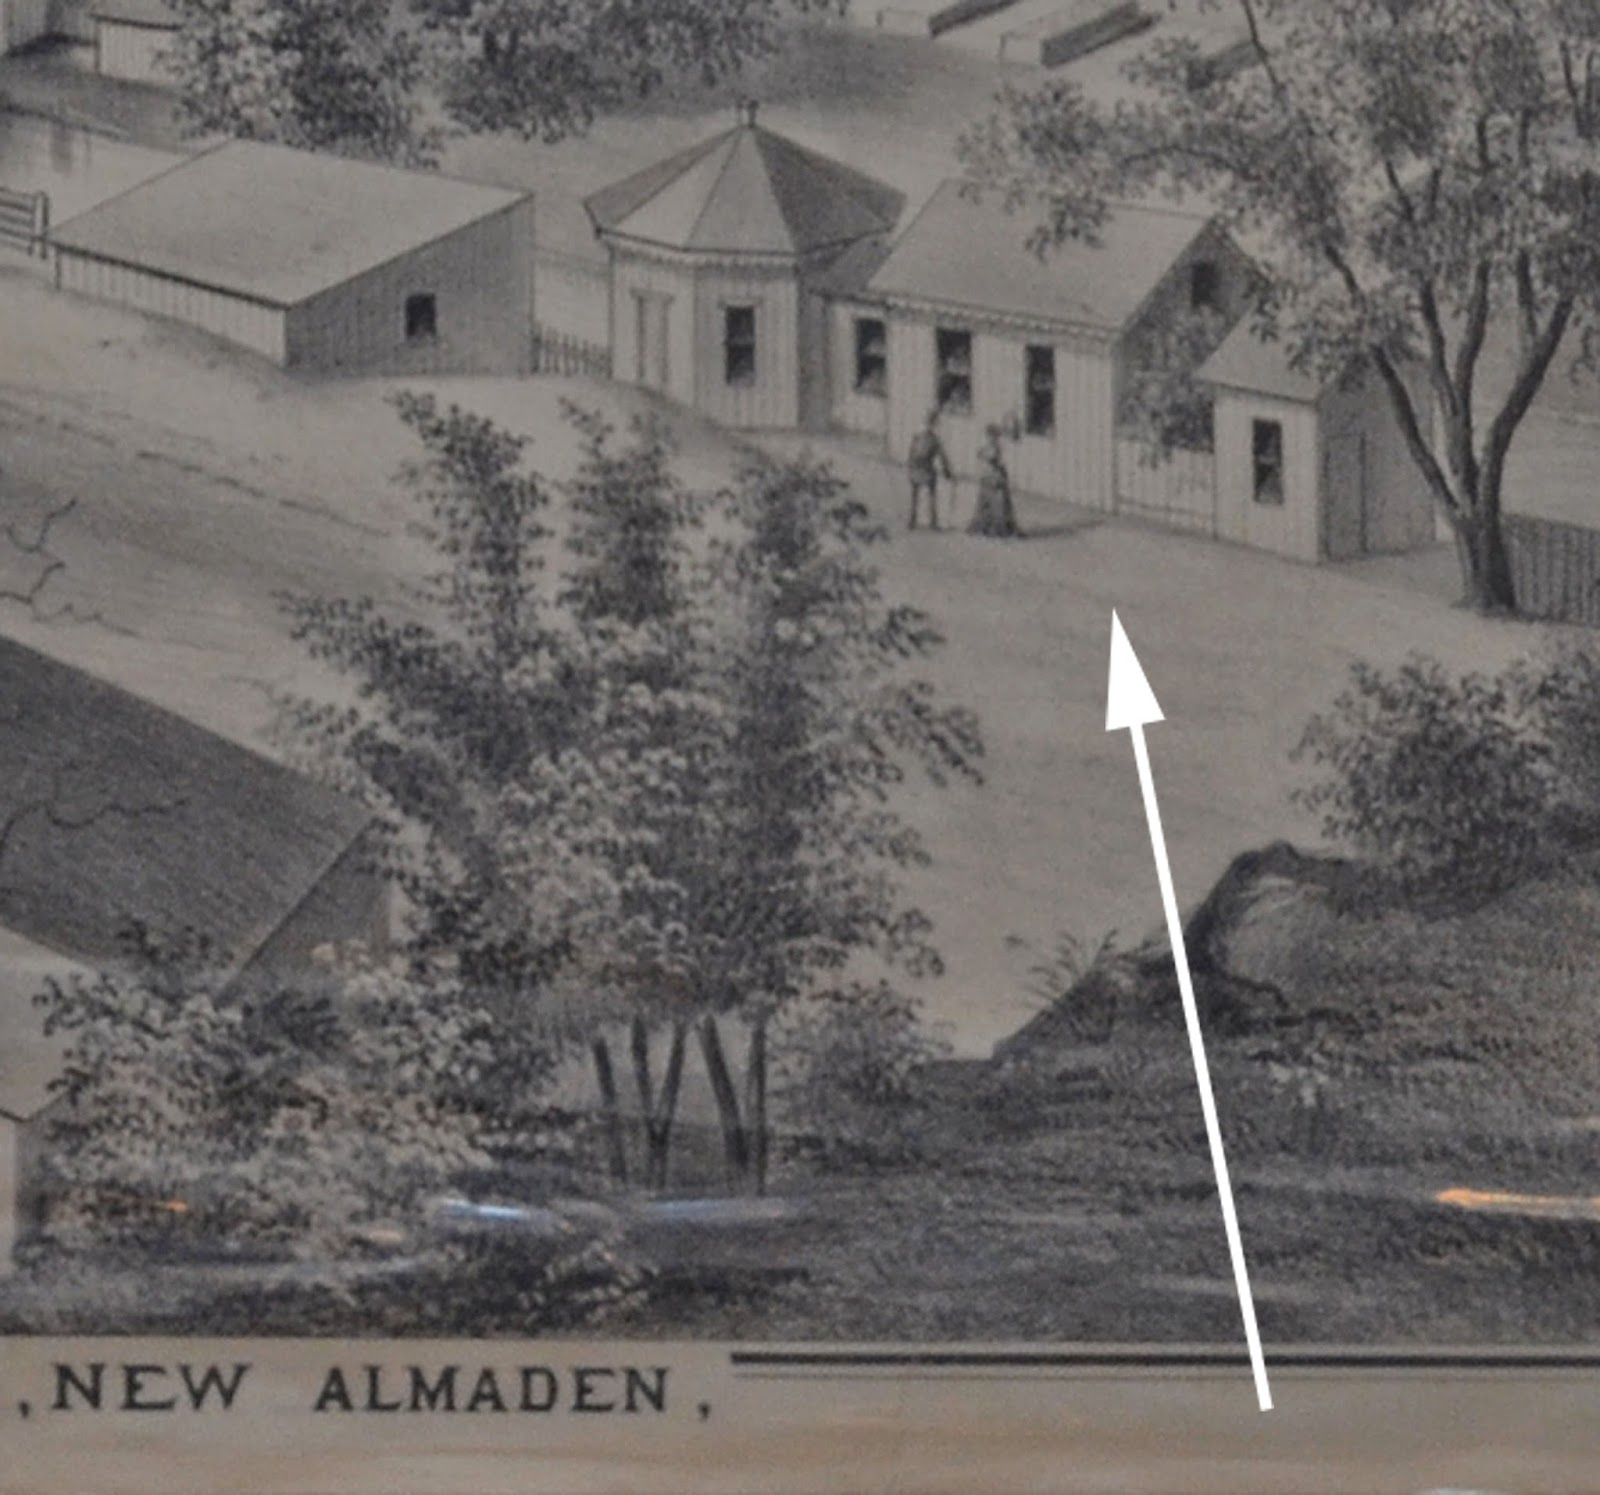 new almaden Title casa grande, pagoda, 21350 almaden road, new almaden, santa clara county, ca contributor names historic american buildings survey, creator.